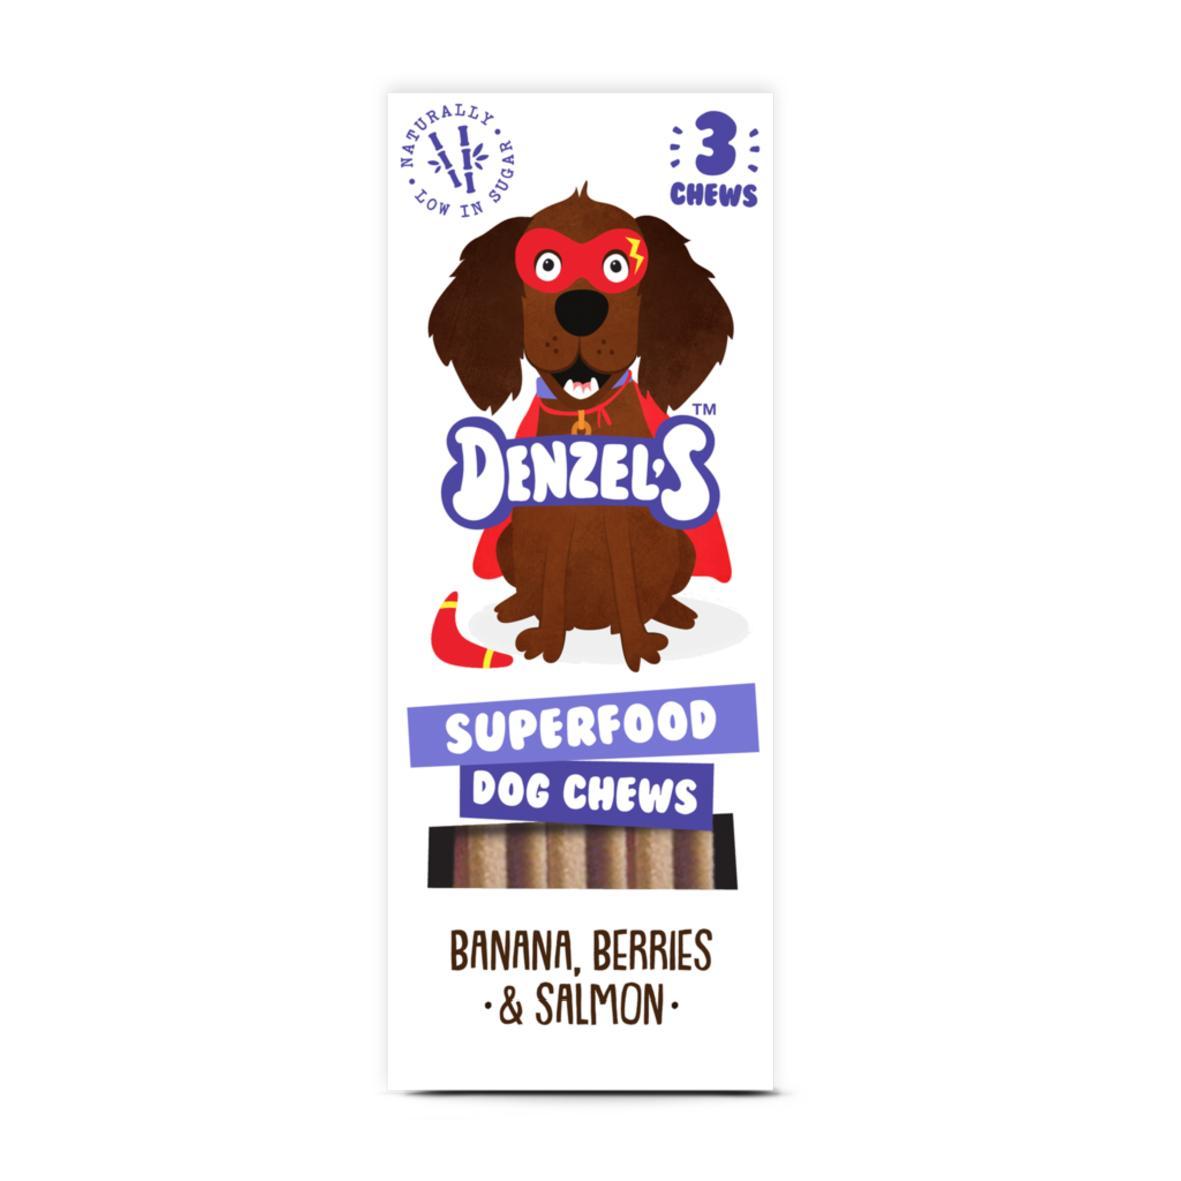 Denzels Superfood Dog Chews Banana, Berries & Salmon 3pk